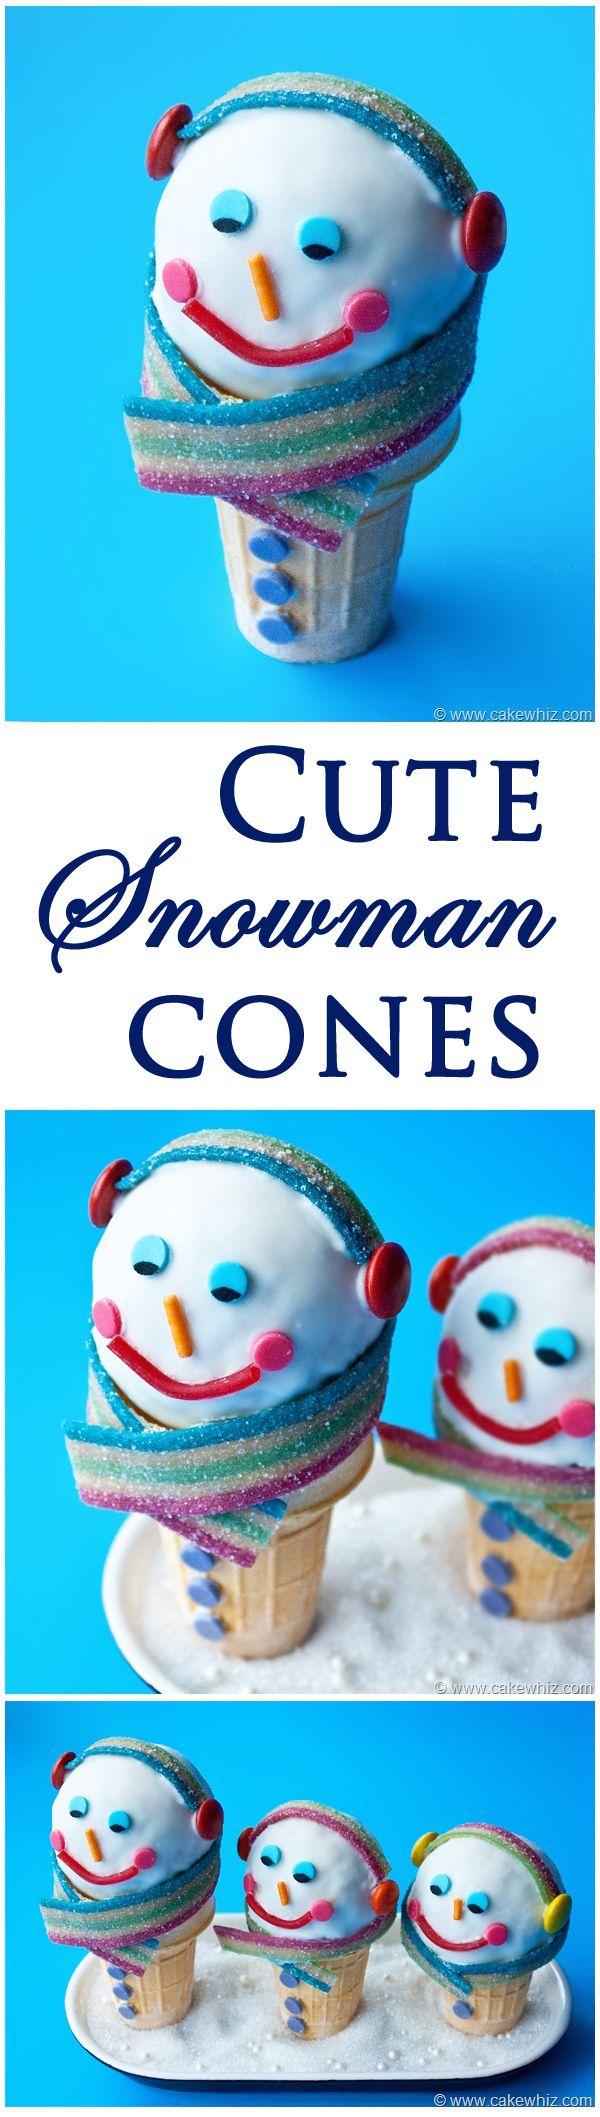 Cute snowman cones... Can't wait to make these!!! @LaVieAnnRose